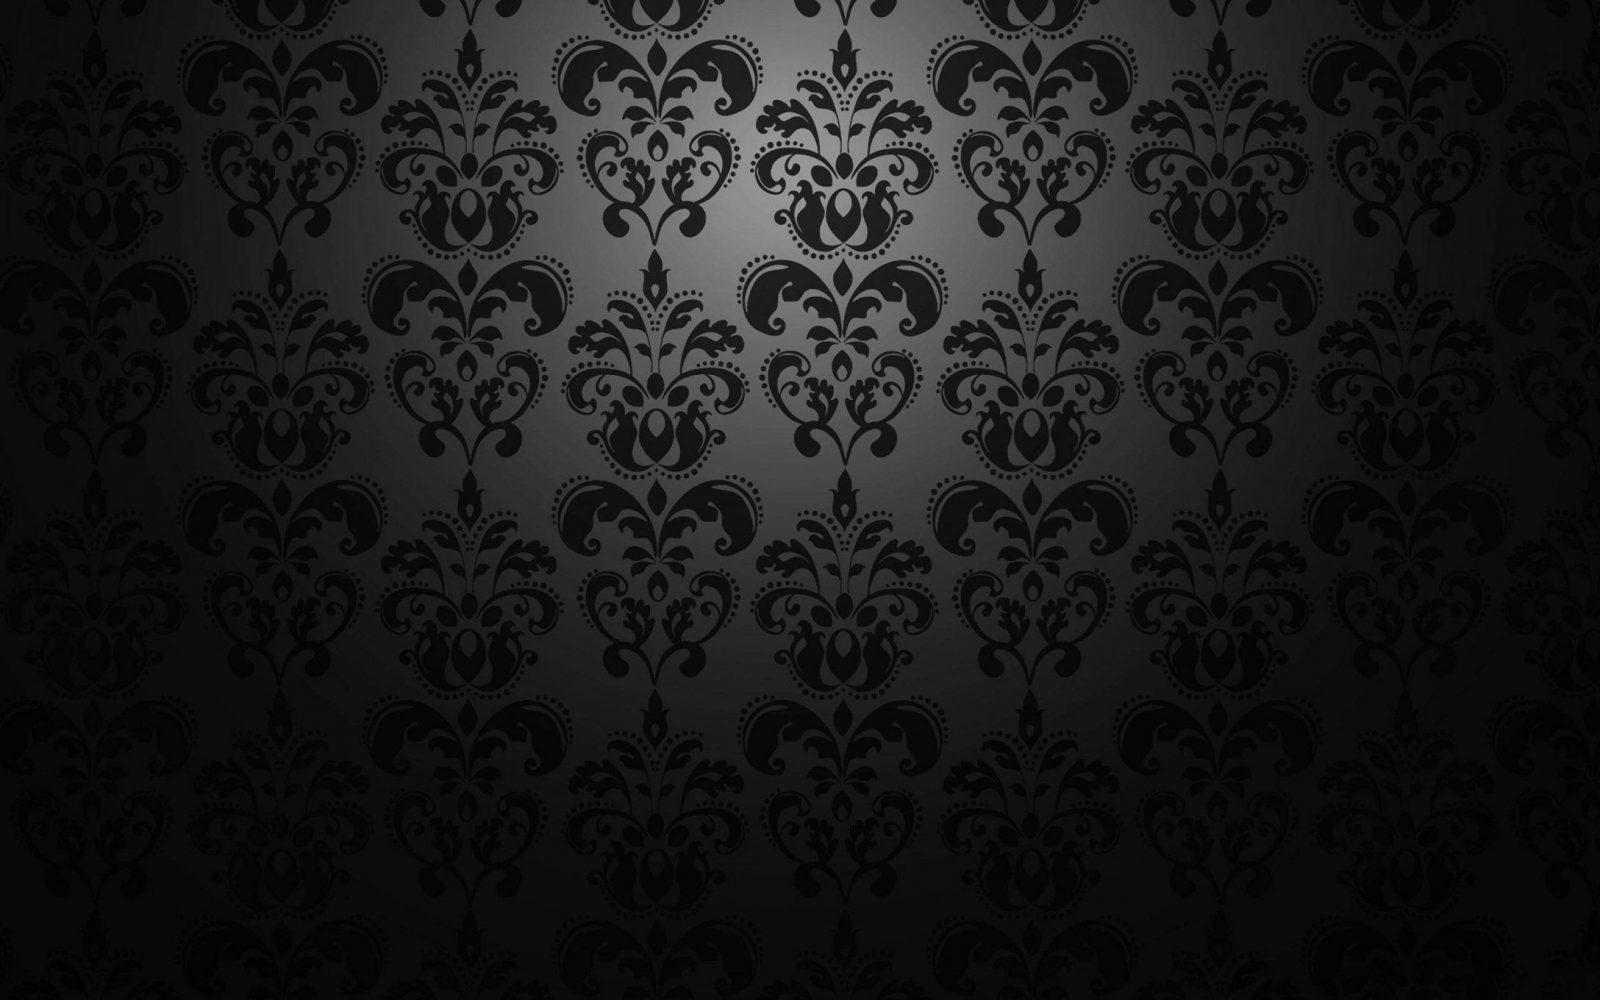 Dunkle schwarze muster tapete hd von schwarze tapete mit for Schwarze tapete